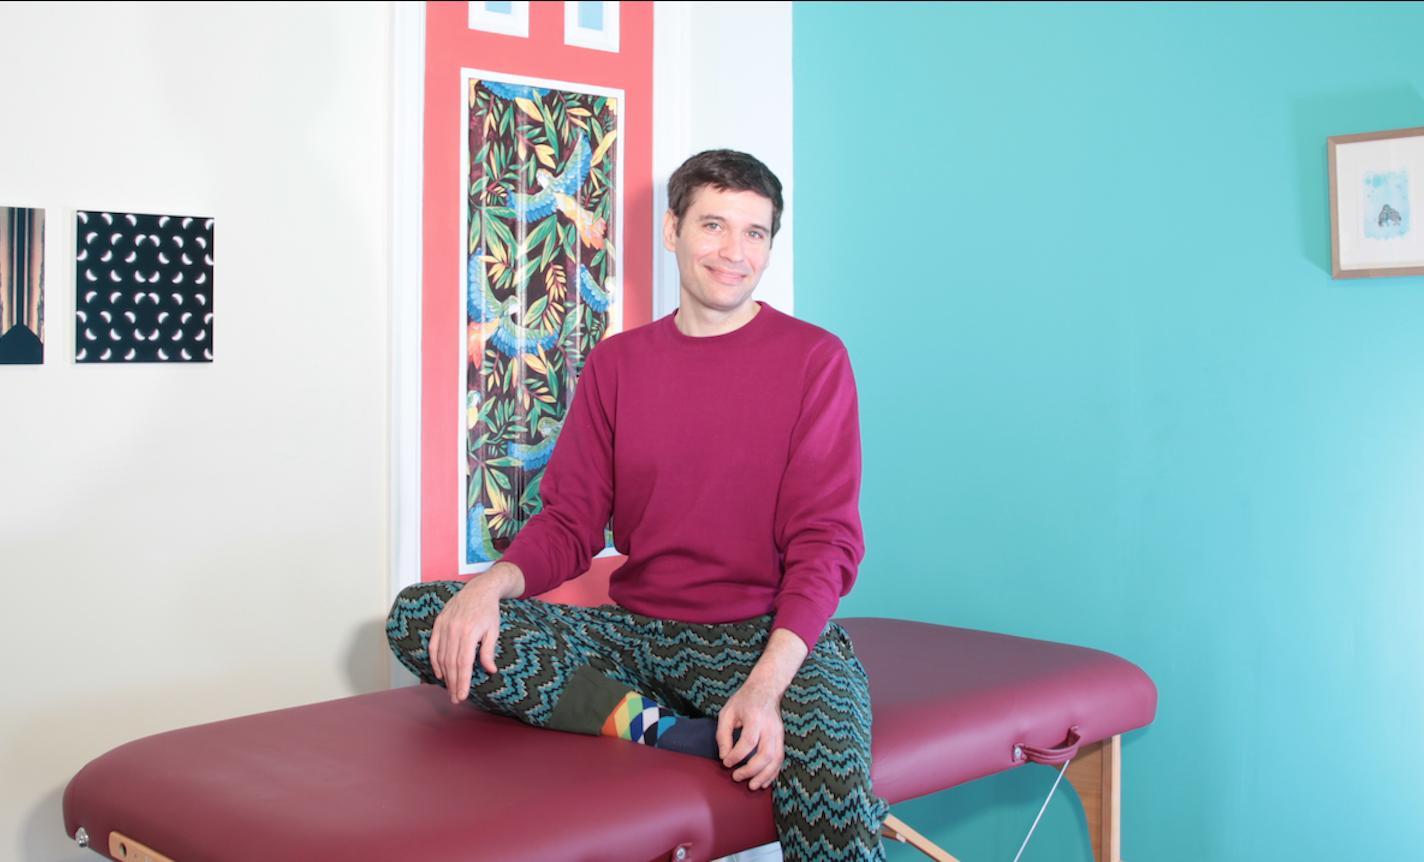 Remote Reiki & Guided Meditation: A Workshop for Healing